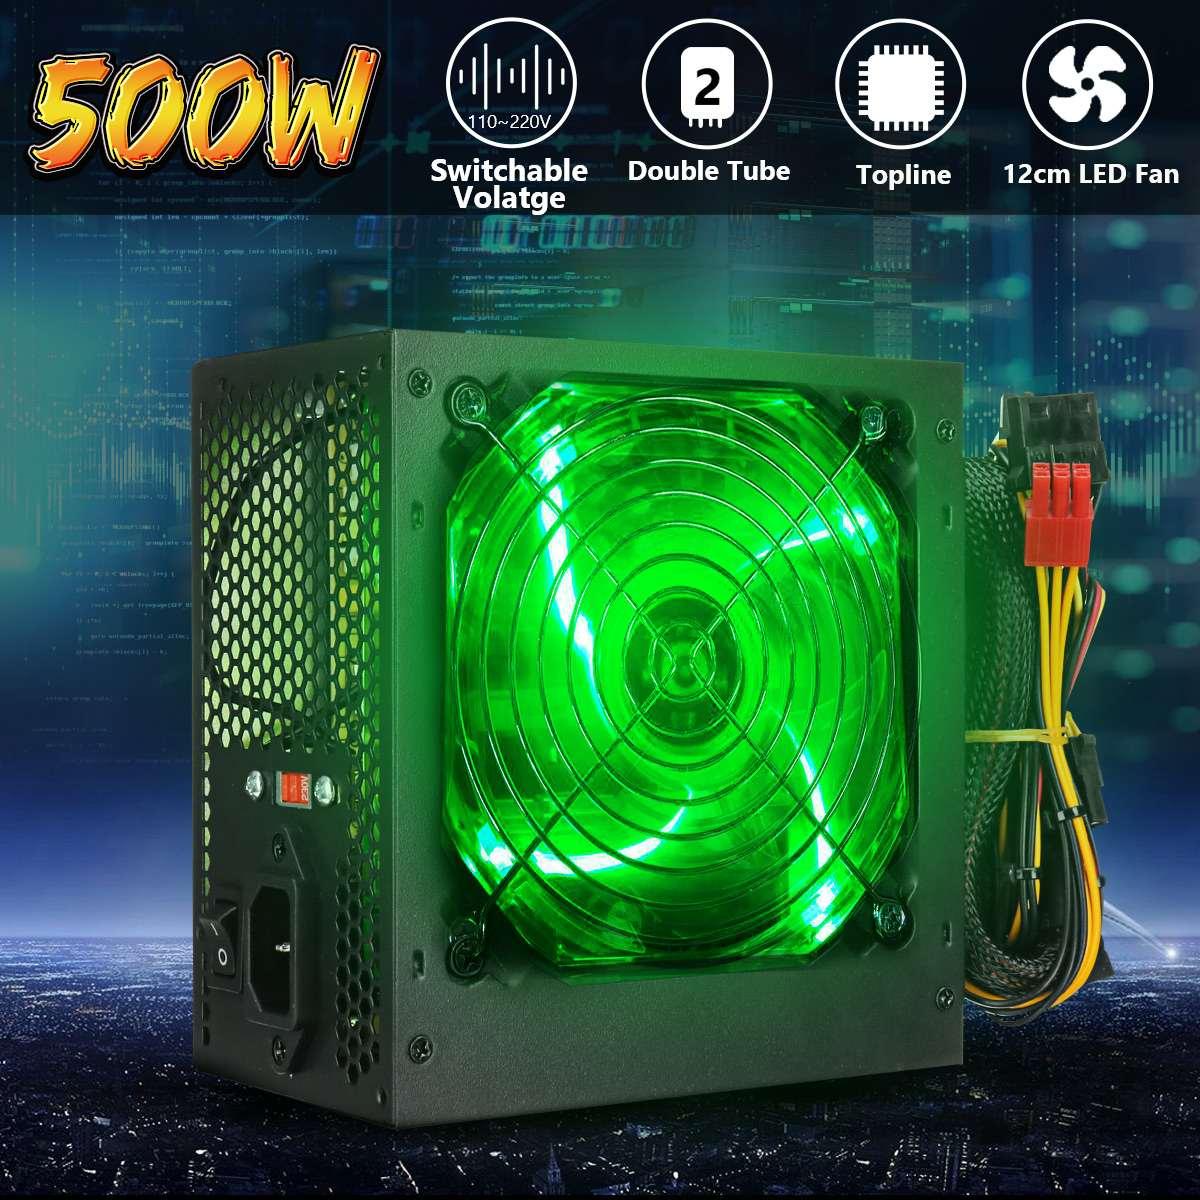 Max 500W Netzteil 120mm LED Fan 24 Pin PCI SATA ATX 12V PC Computer Netzteil für Desktop-Gaming-Computer